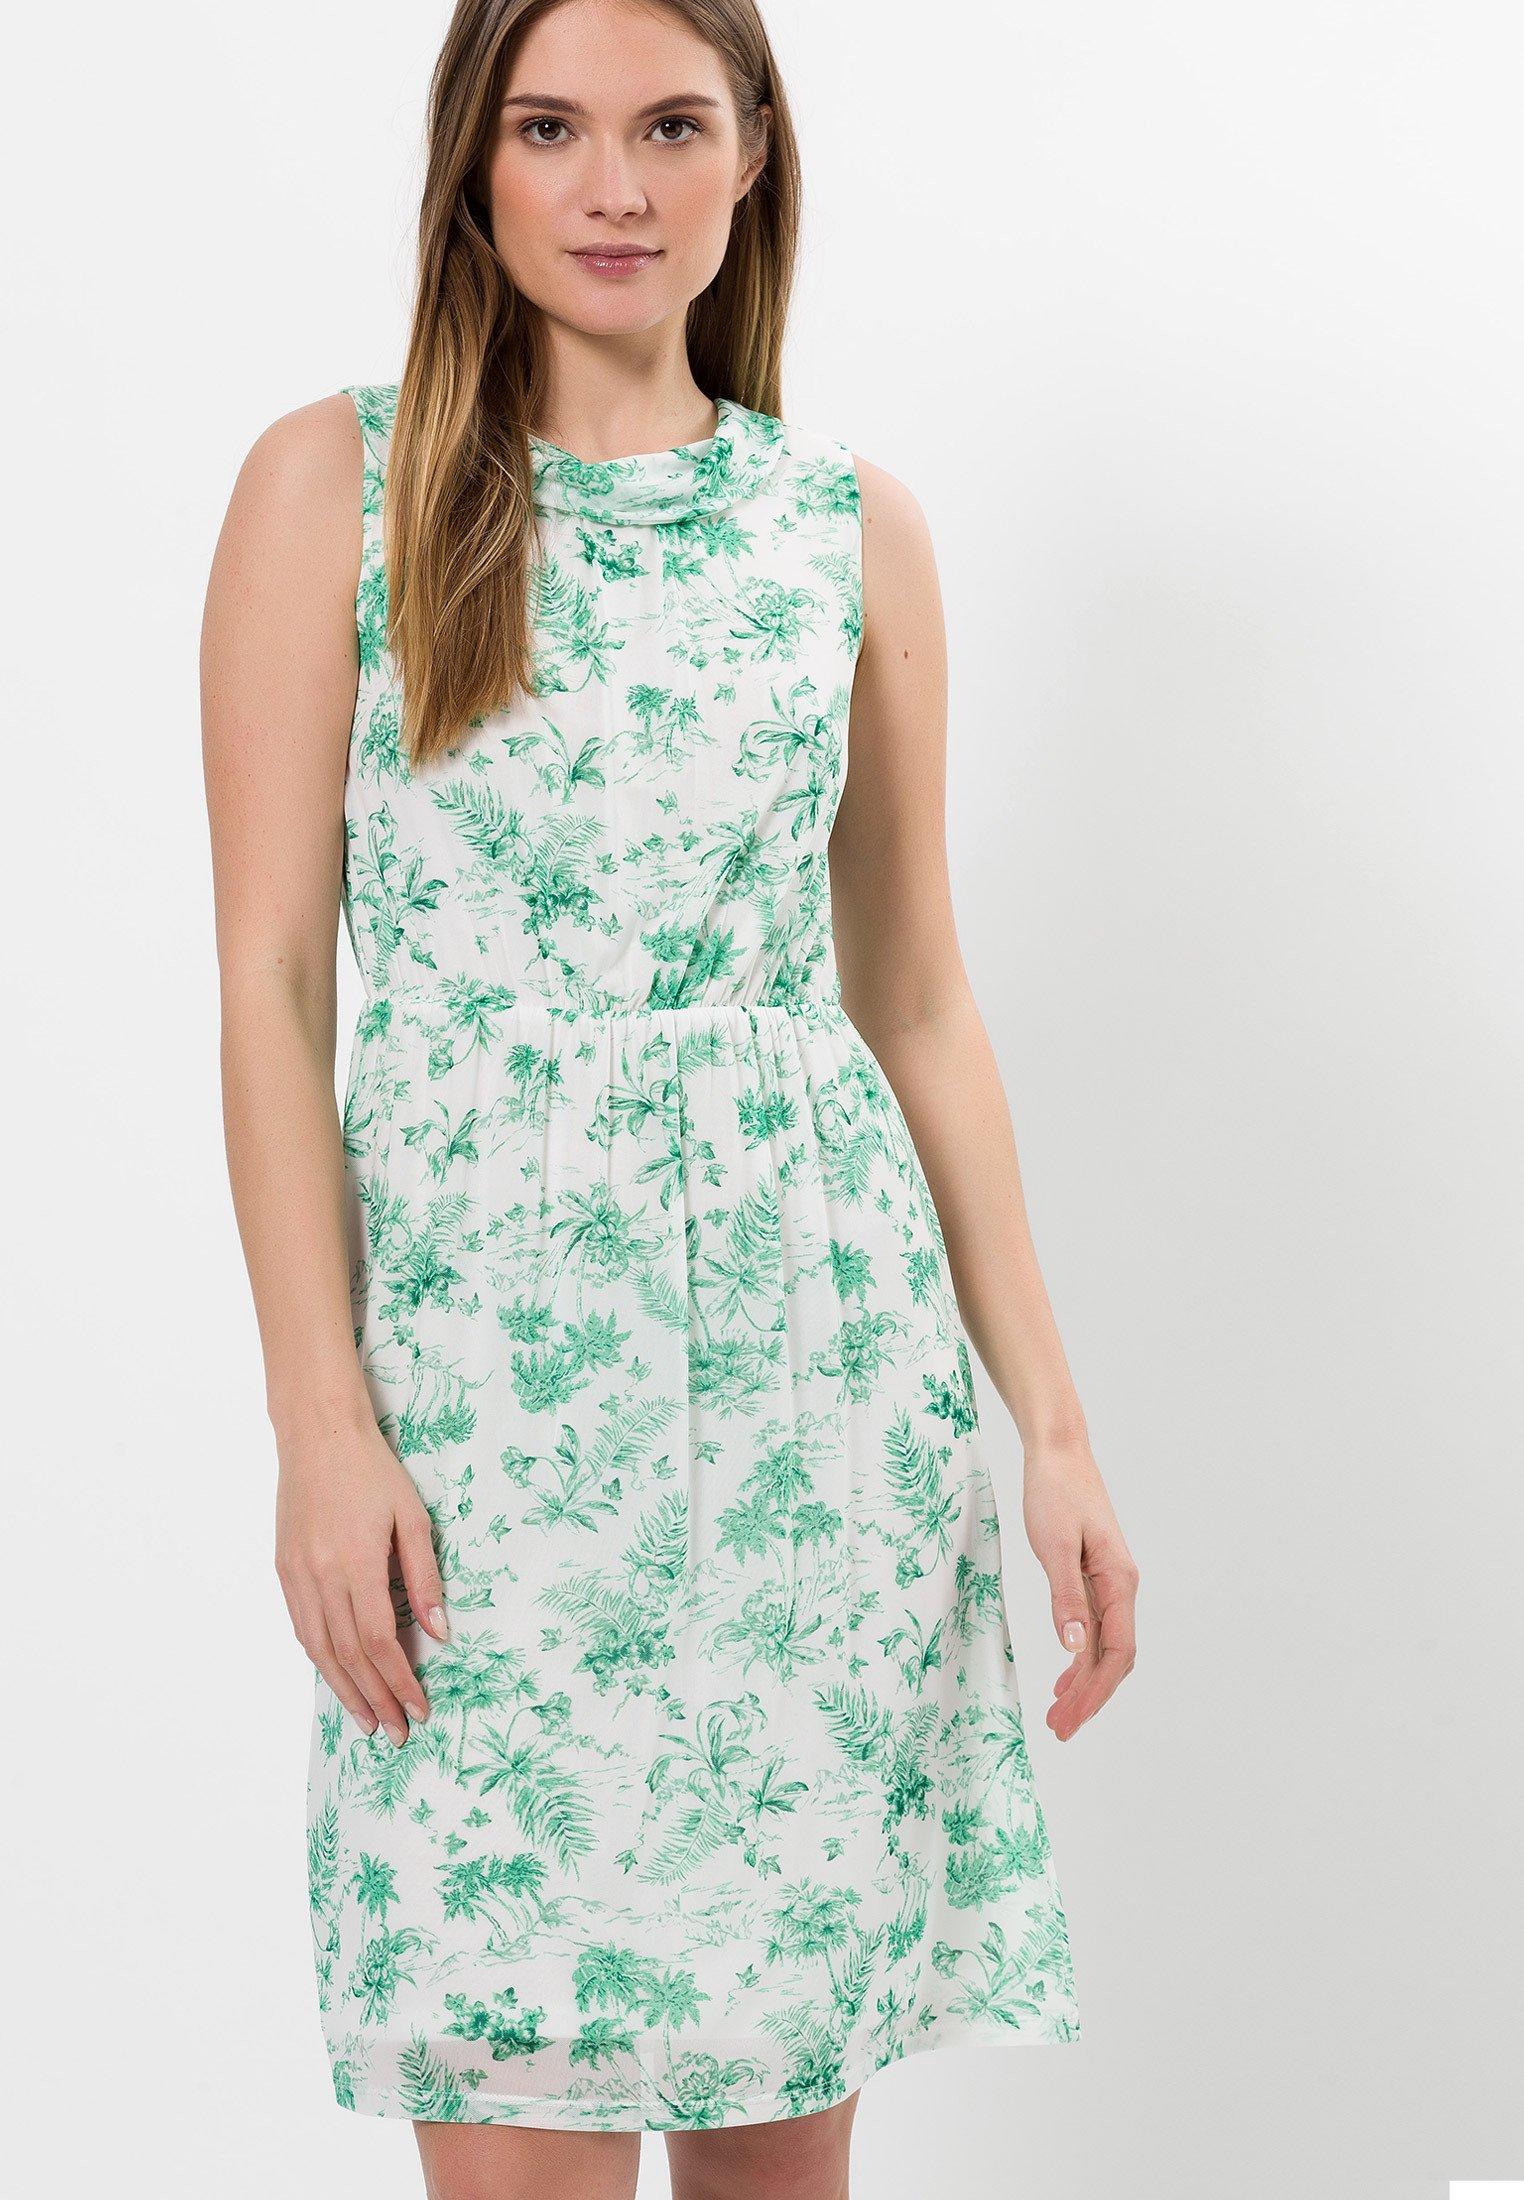 Zero Kleid Mit Blumendruck Jerseykleid Peppermint Turkis Zalando De